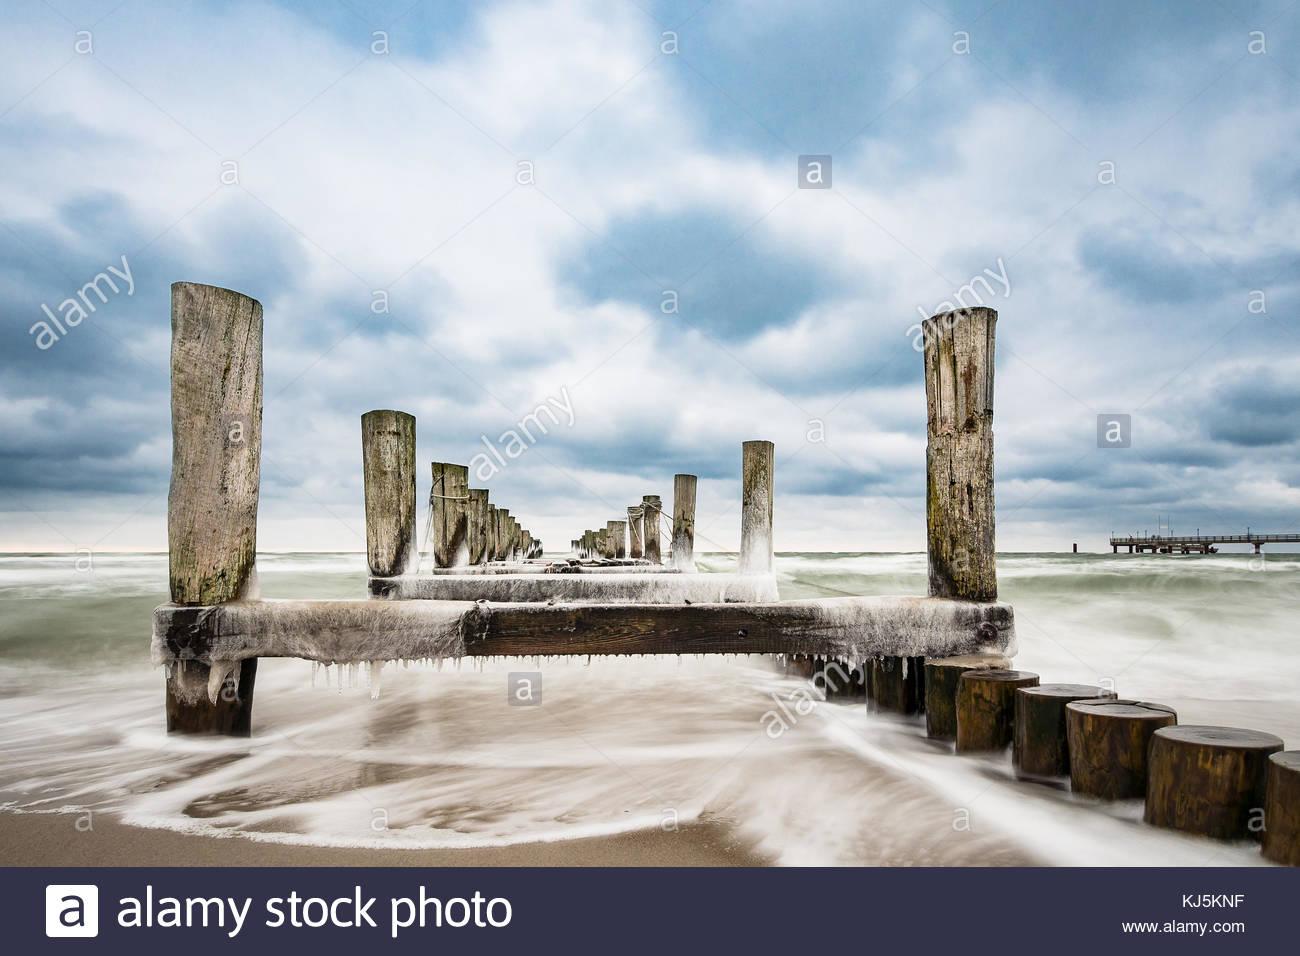 Buhne an der Ostsee Stockbild